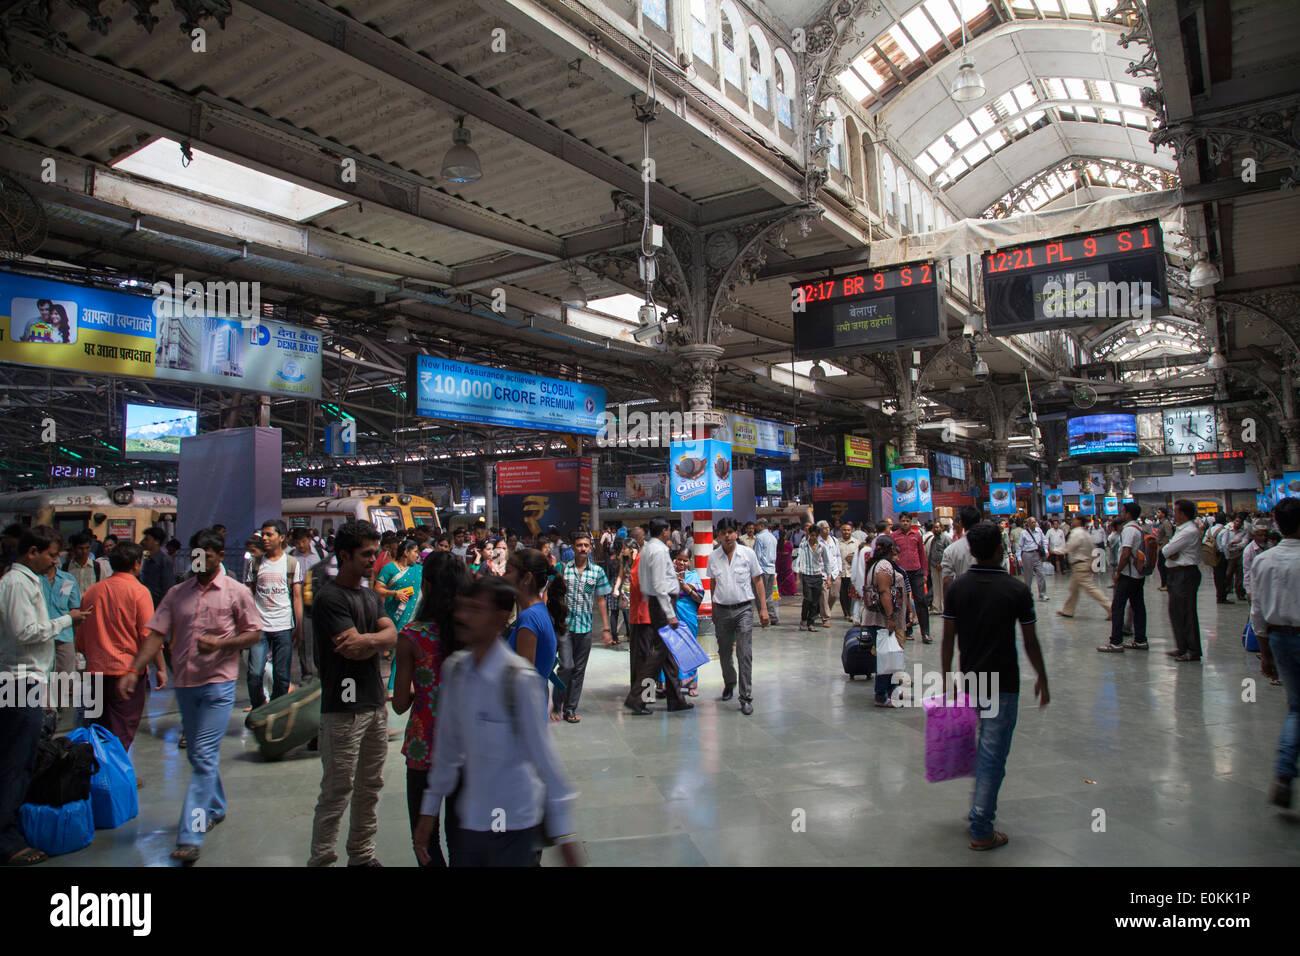 Commuters inside Victoria Terminus ( Chhatrapati Shivaji ...  Commuters insid...